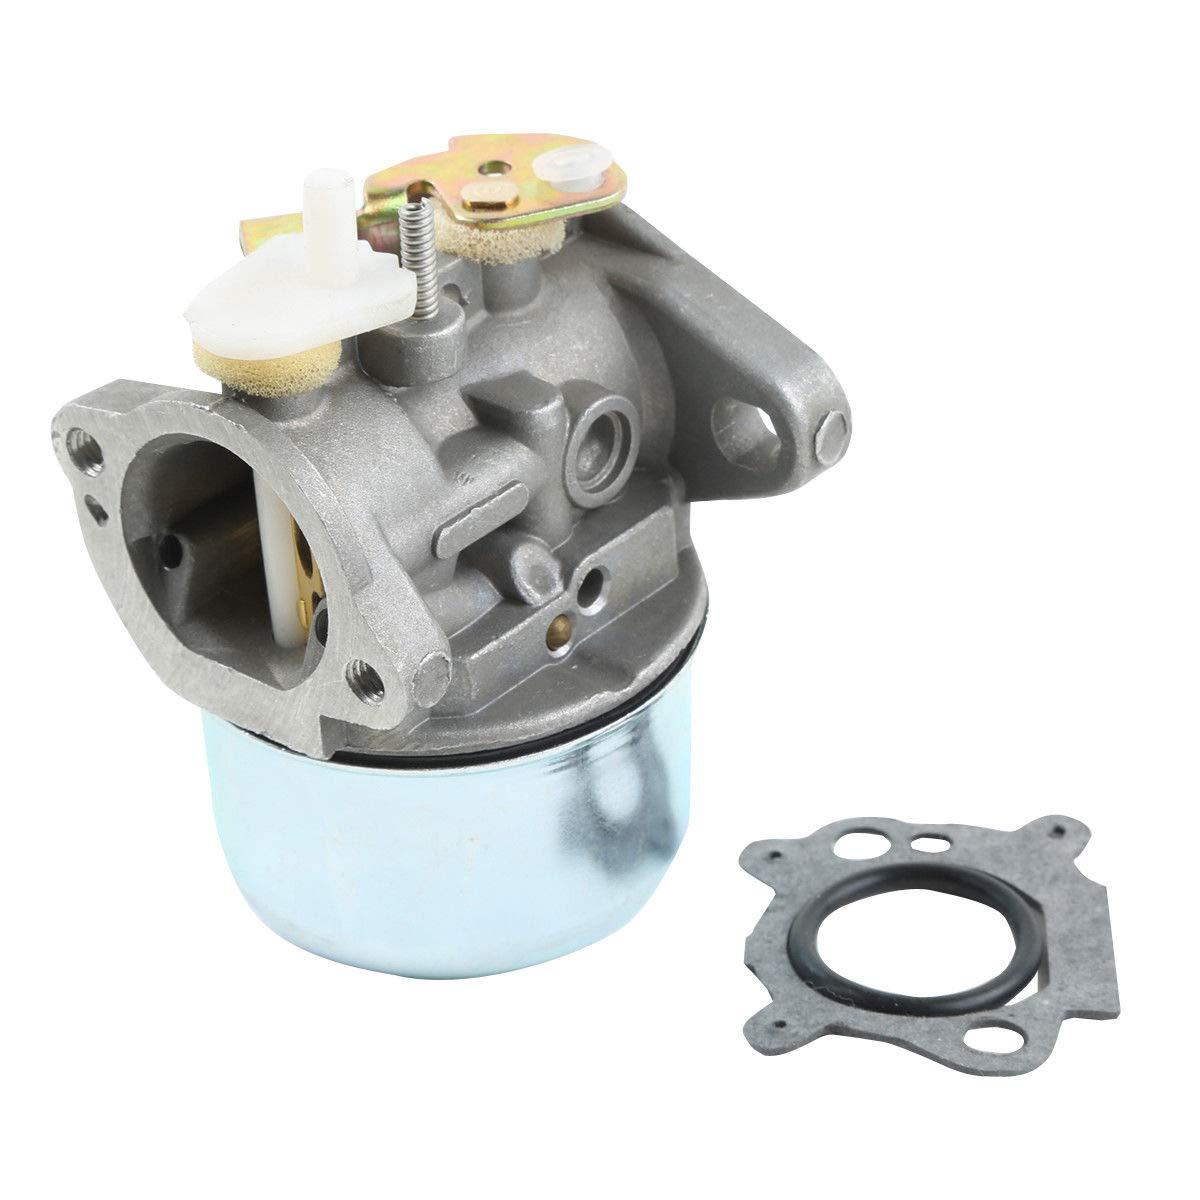 TCMT Carburetor Fit For Briggs /& Stratton 499059 497586 Gasket /& Choke Lawnmower Carb